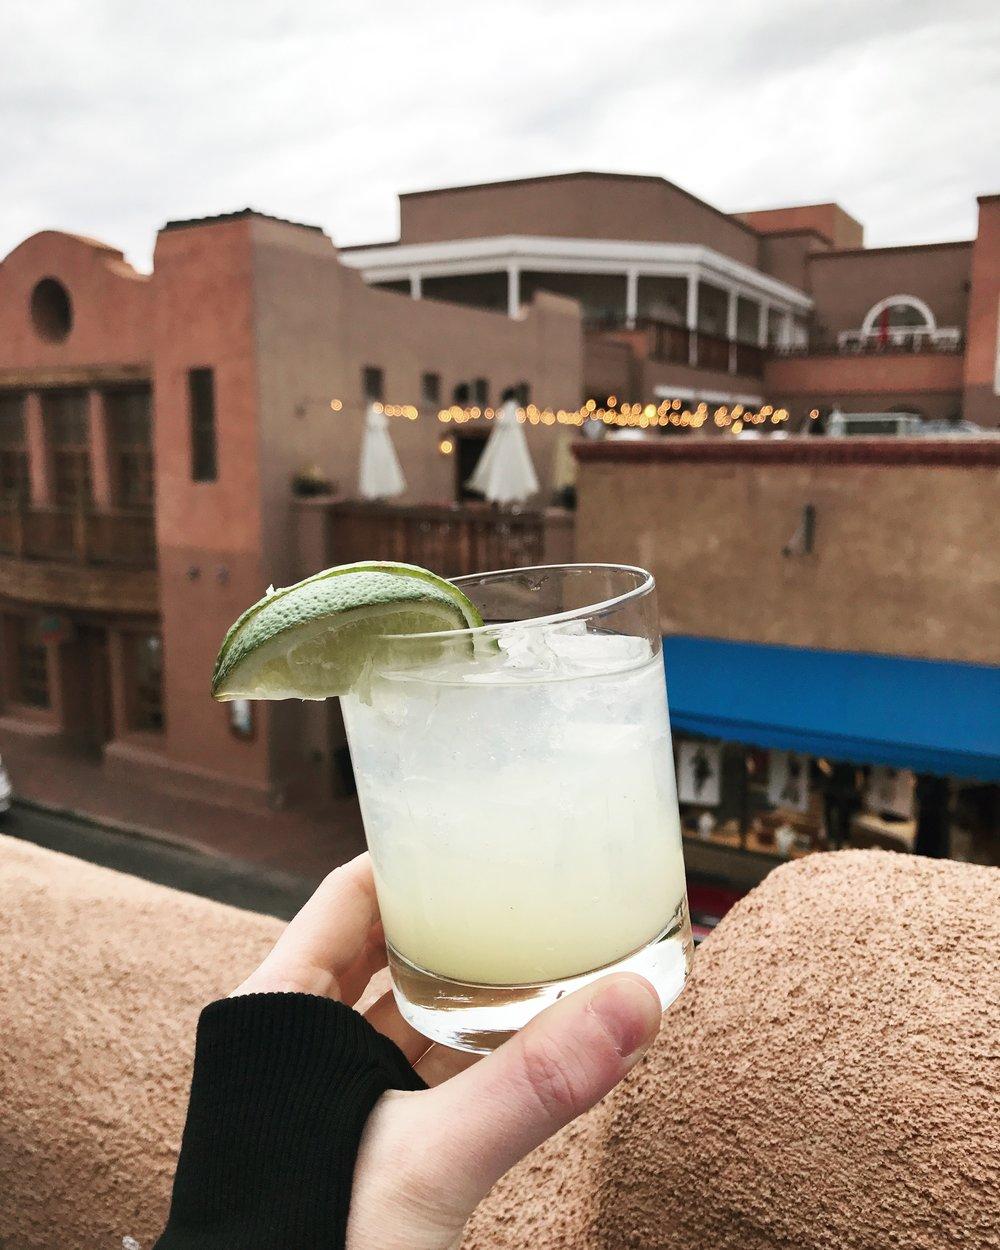 Santa Fe, NM - EAT + DRINK THIS